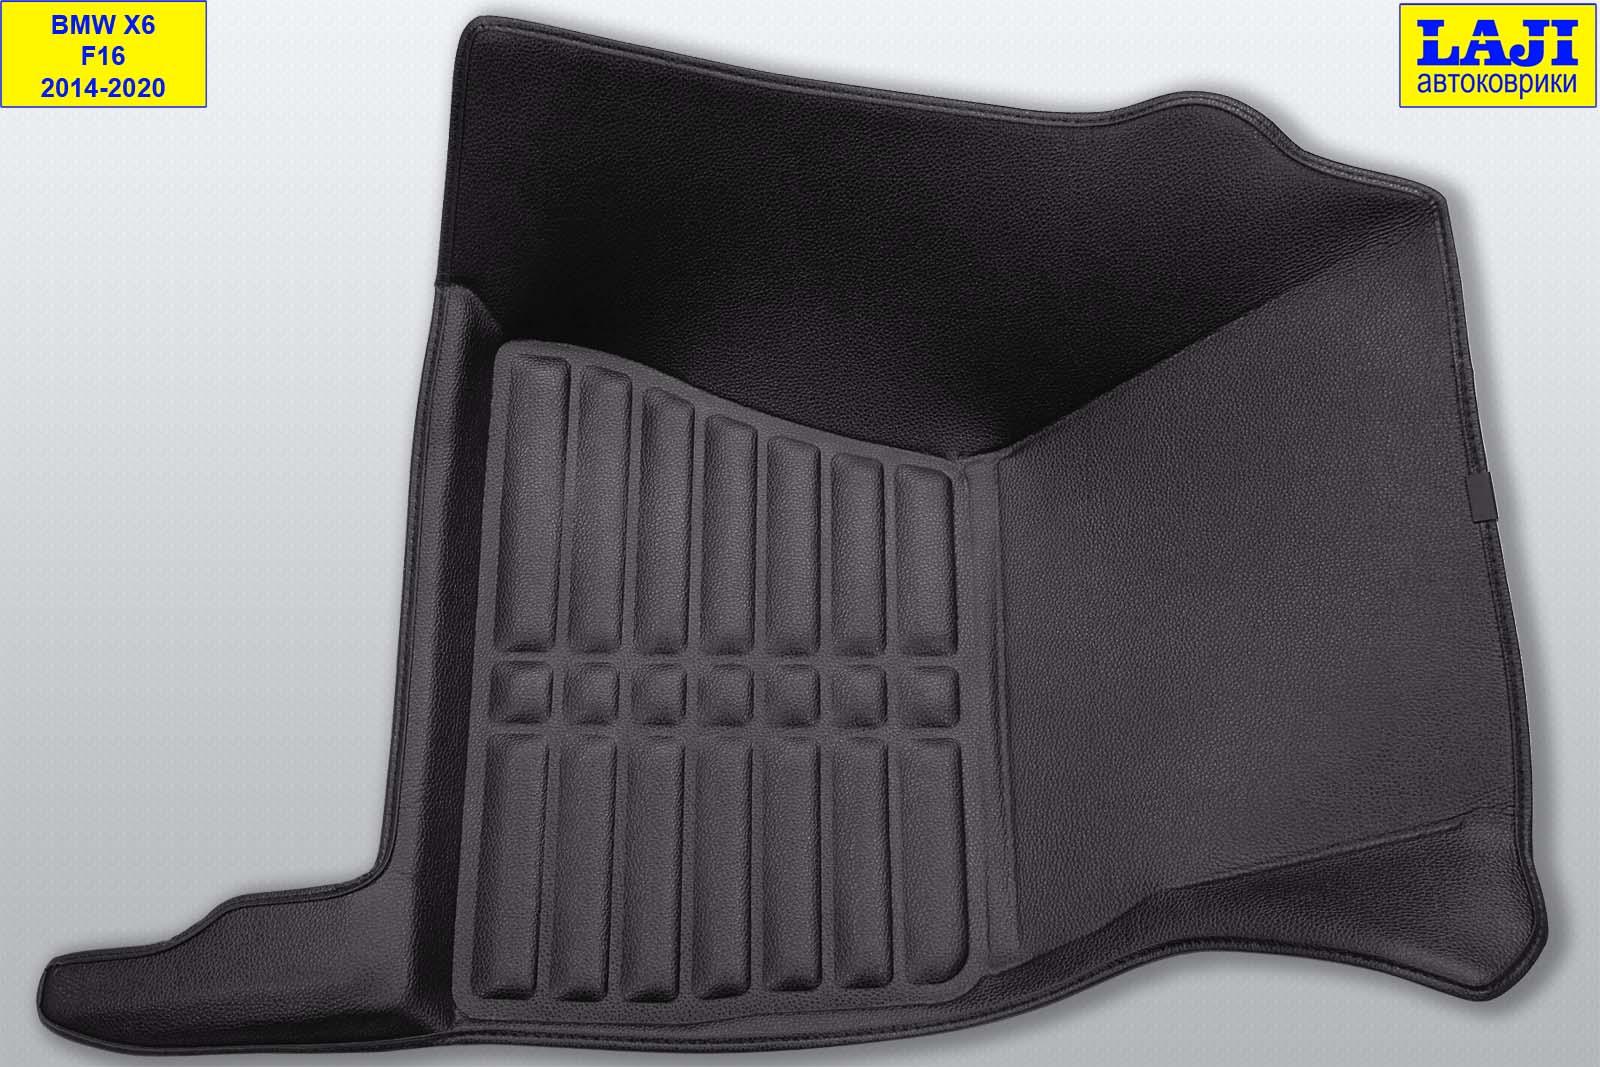 5D коврики в салон BMW X6 (F16) 2014-2020 4